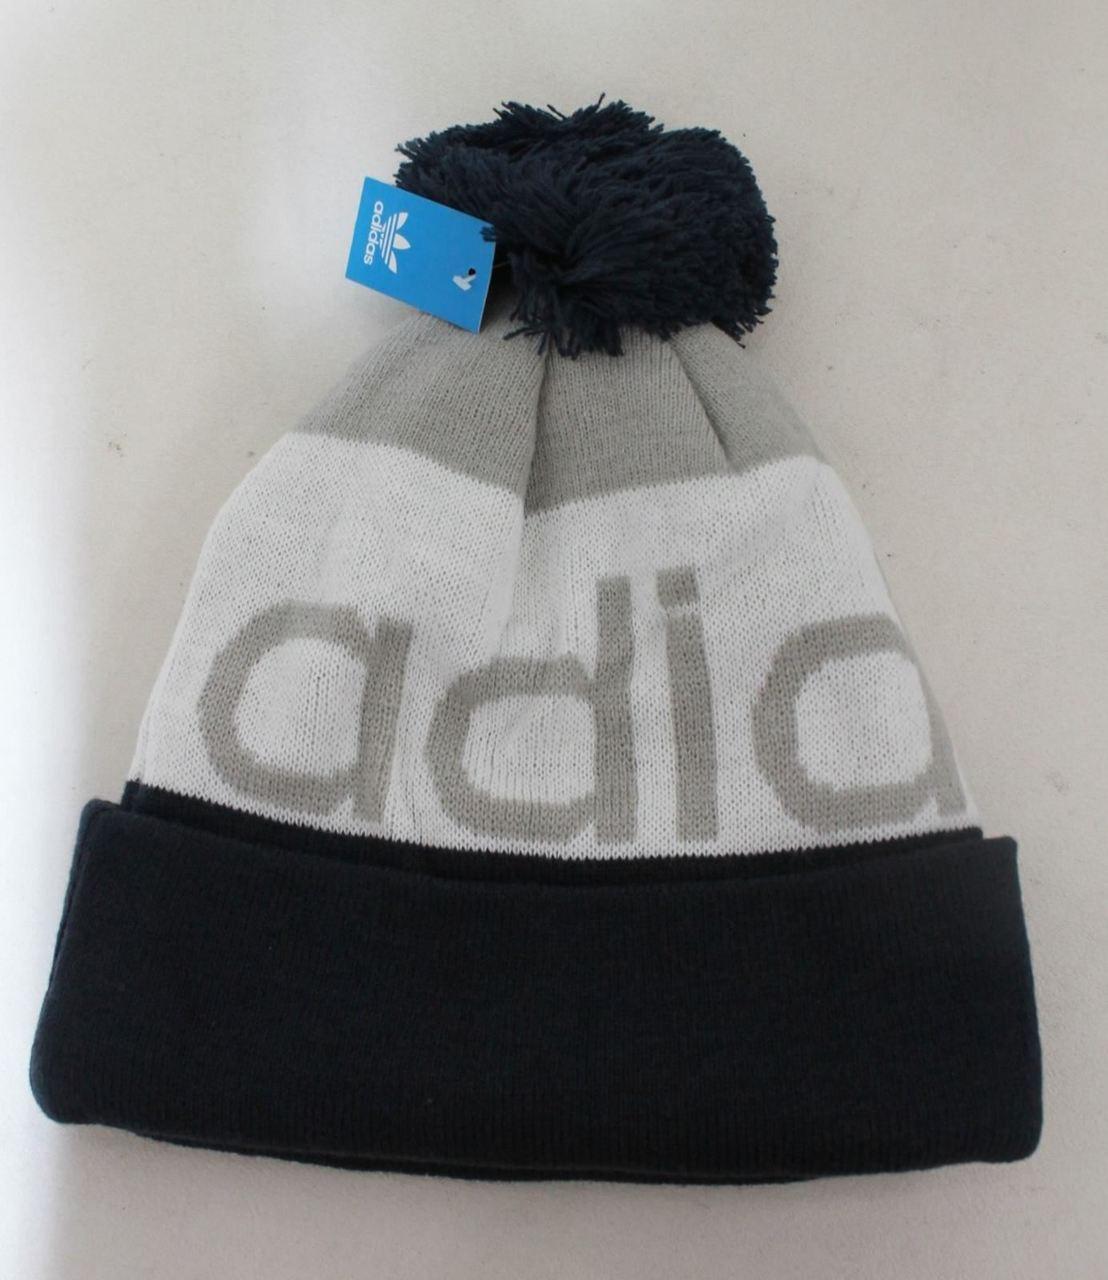 74c99ae126a NEW ADIDAS Unisex Mercer Ballie Pom Beanie Navy White Grey Winter Hat Cap -  Stuff U Sell